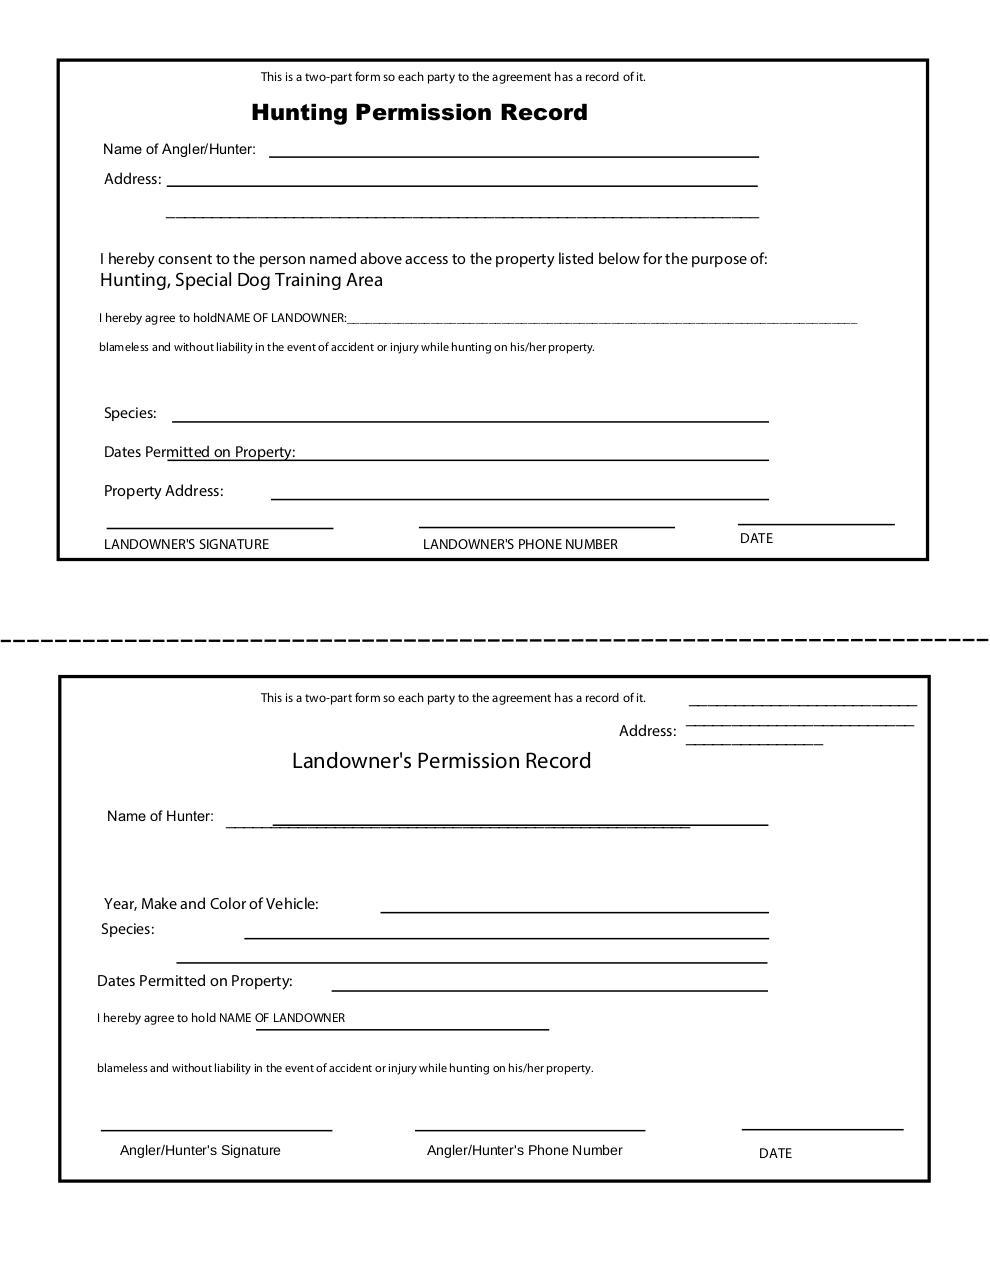 pdf archive